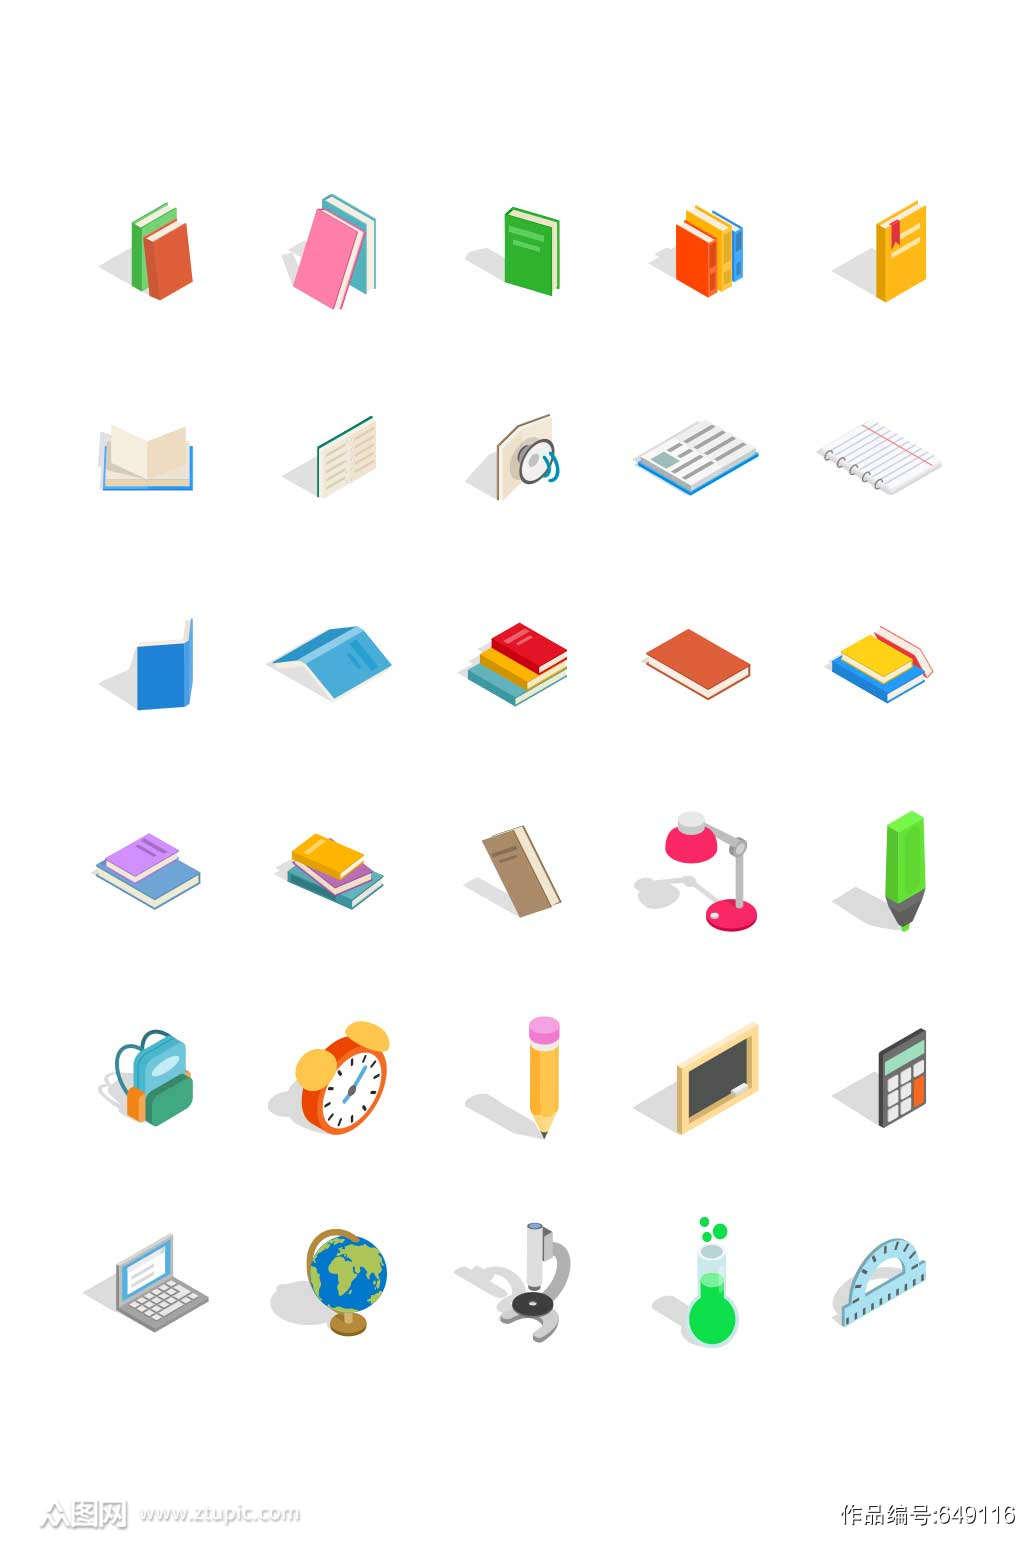 立体书籍UI图标.ai素材